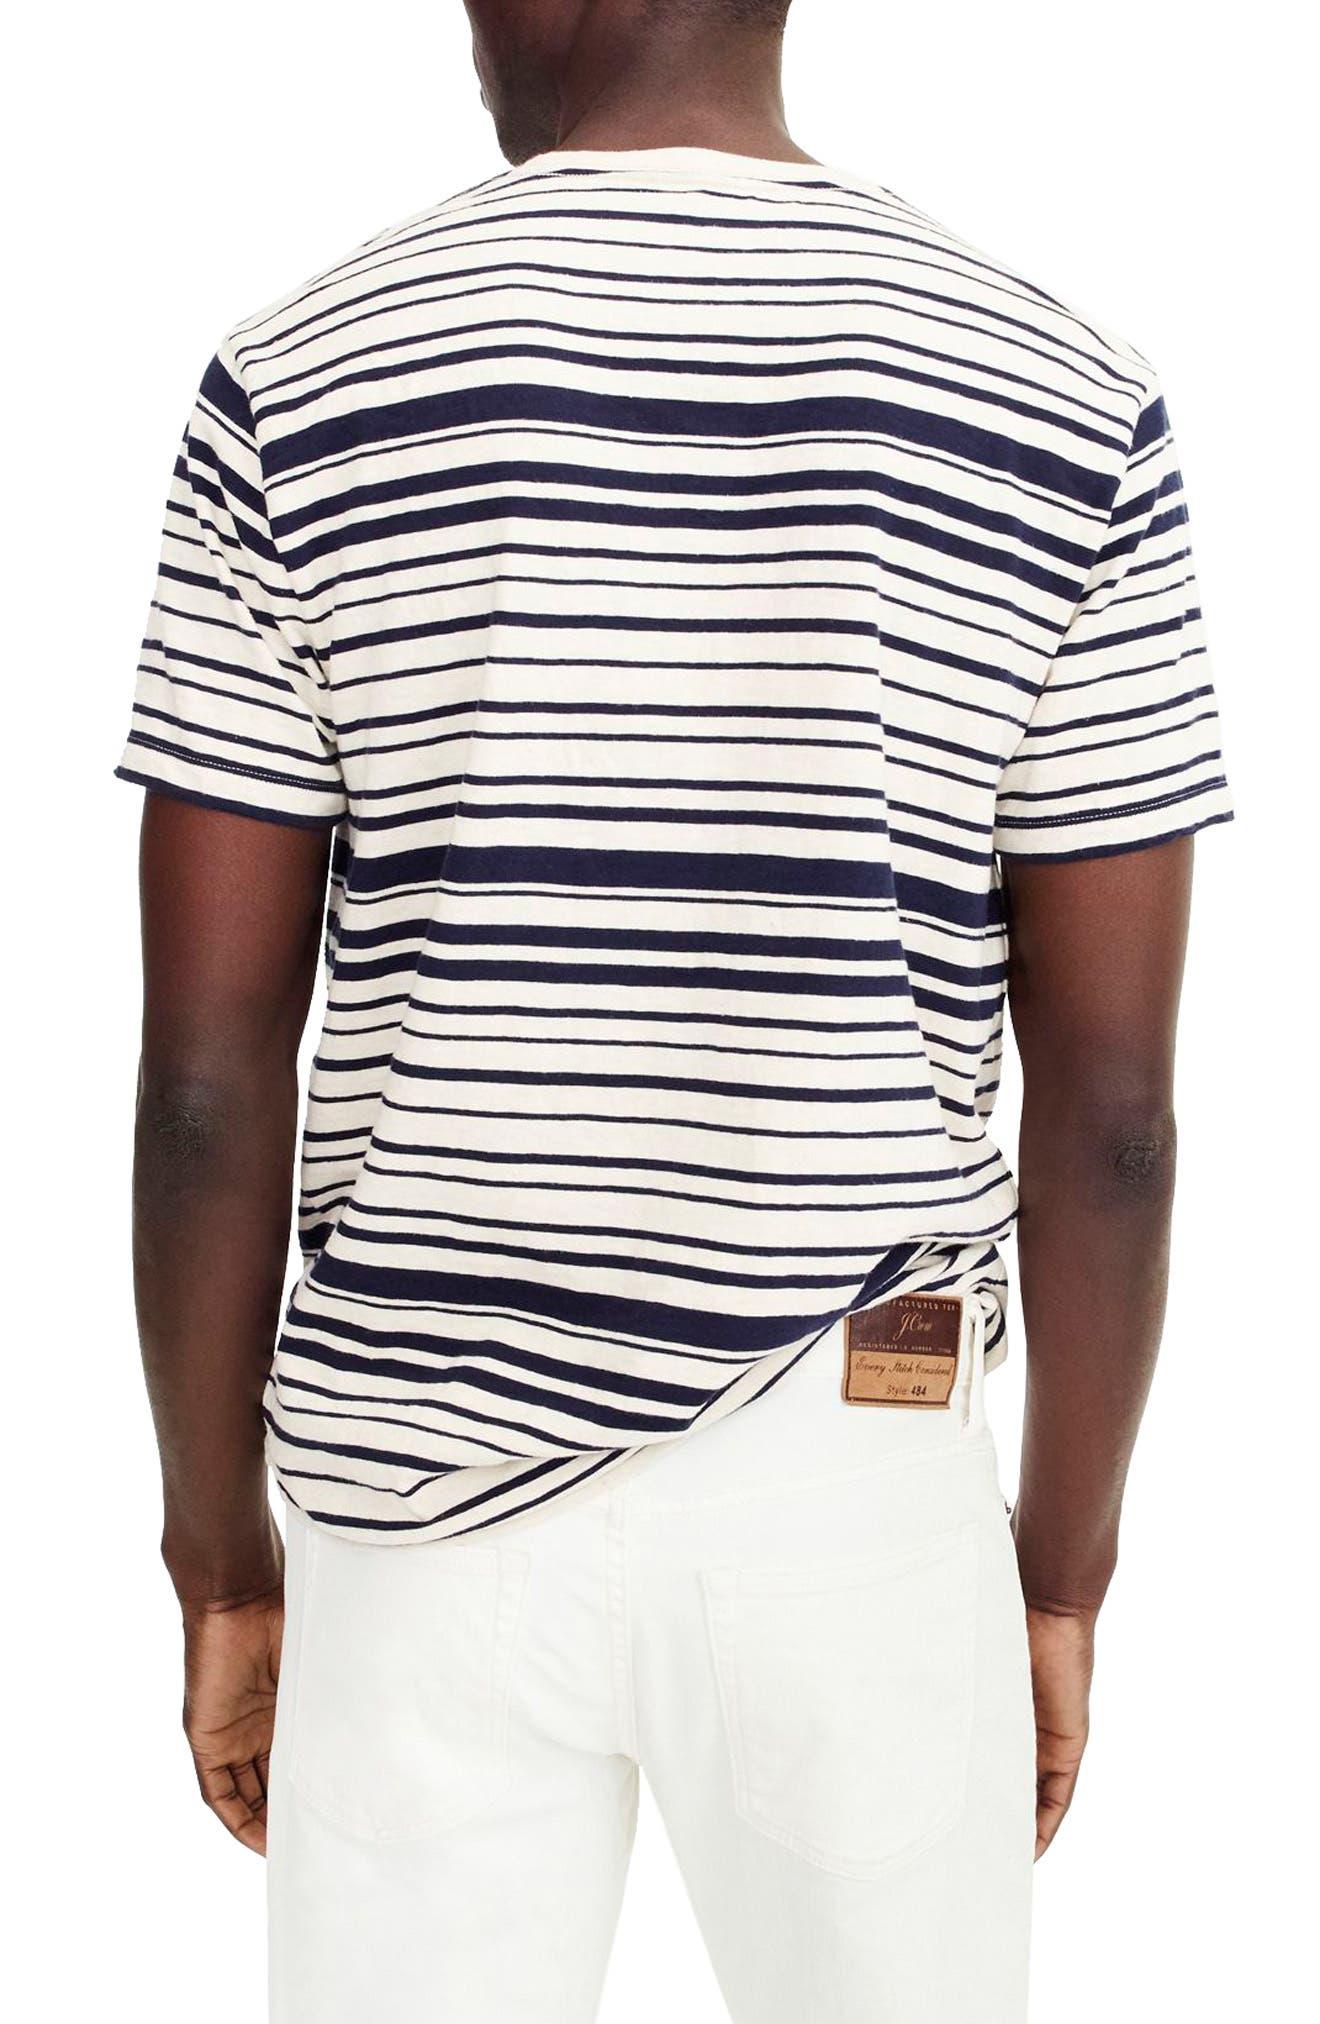 Variegated Stripe Slub Cotton T-Shirt,                             Alternate thumbnail 2, color,                             Ivory Navy